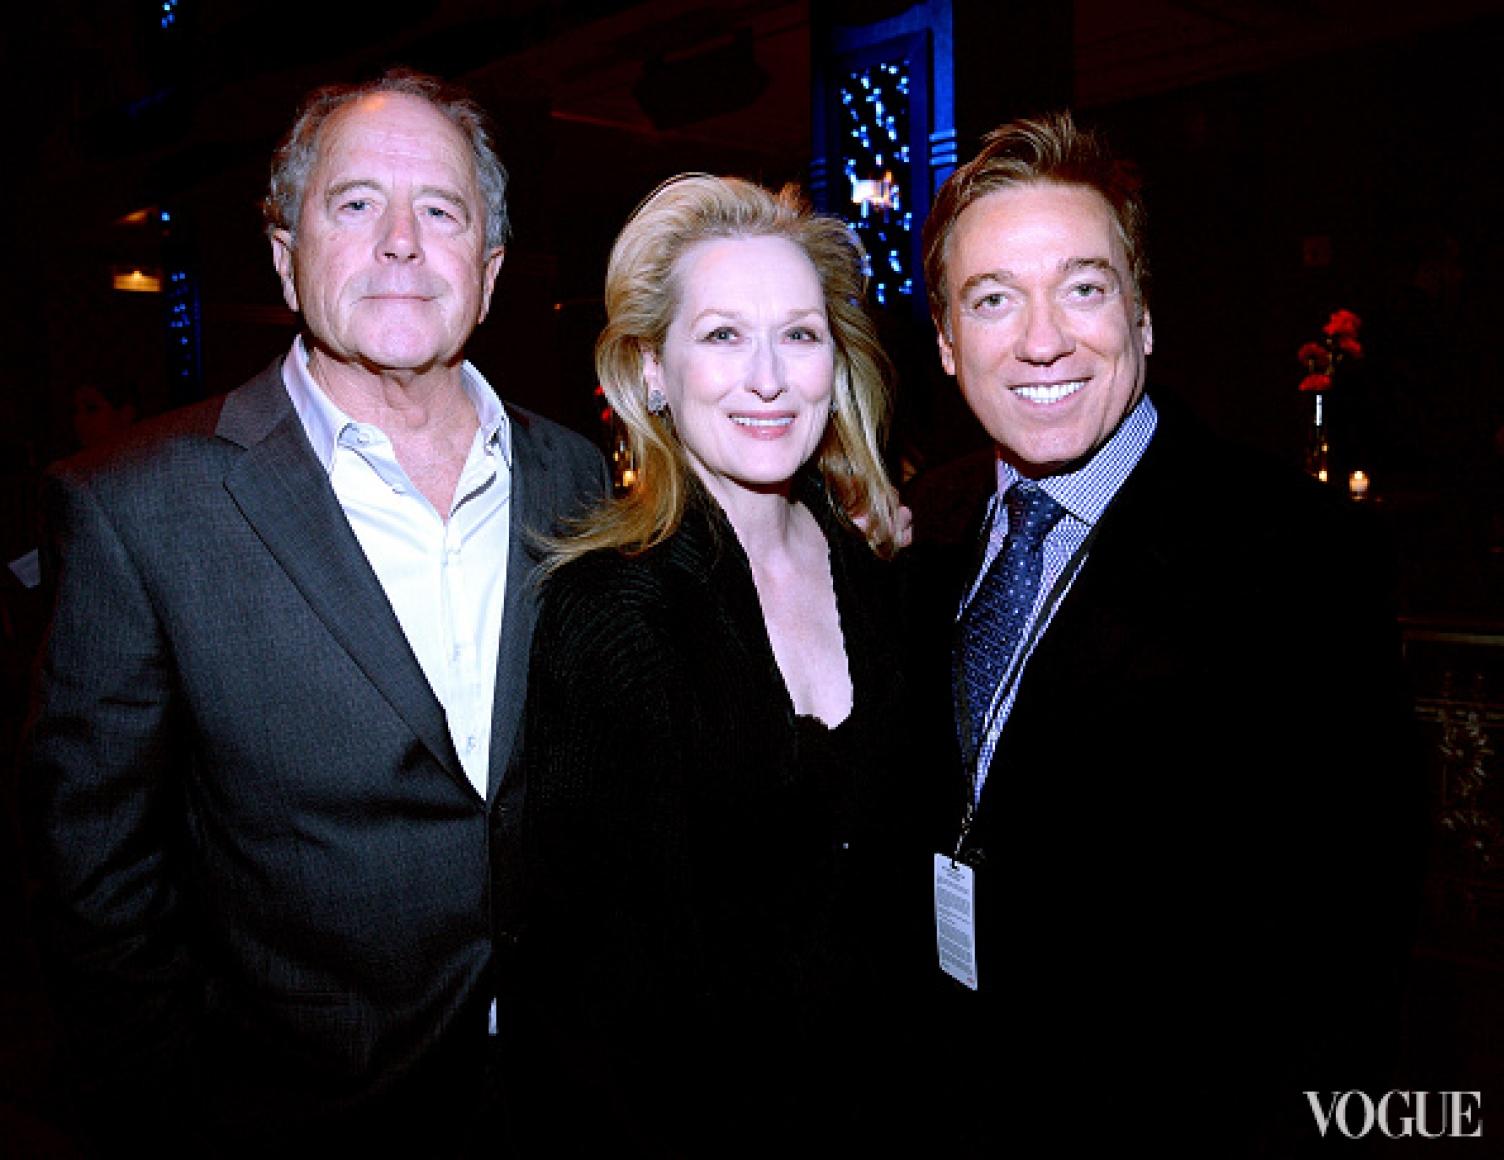 Мэрил Стрип, ее супруг Дон Гаммер (слева) и Кевин Хавана